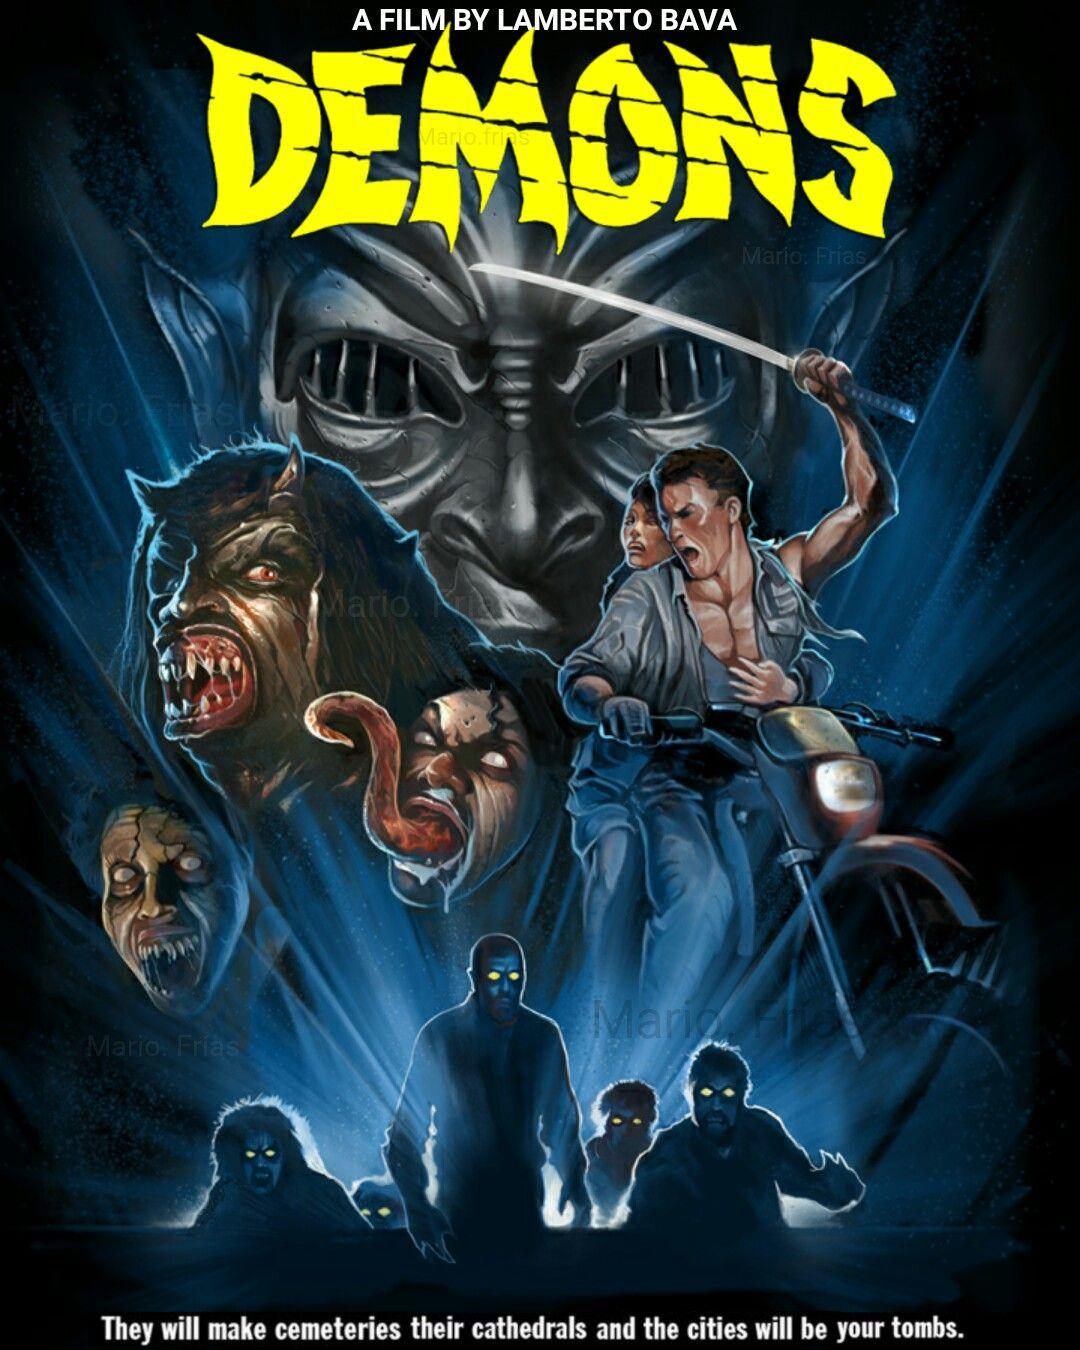 10+ ideas de Demons (1985) | cine de terror, carteles de cine, peliculas de  terror